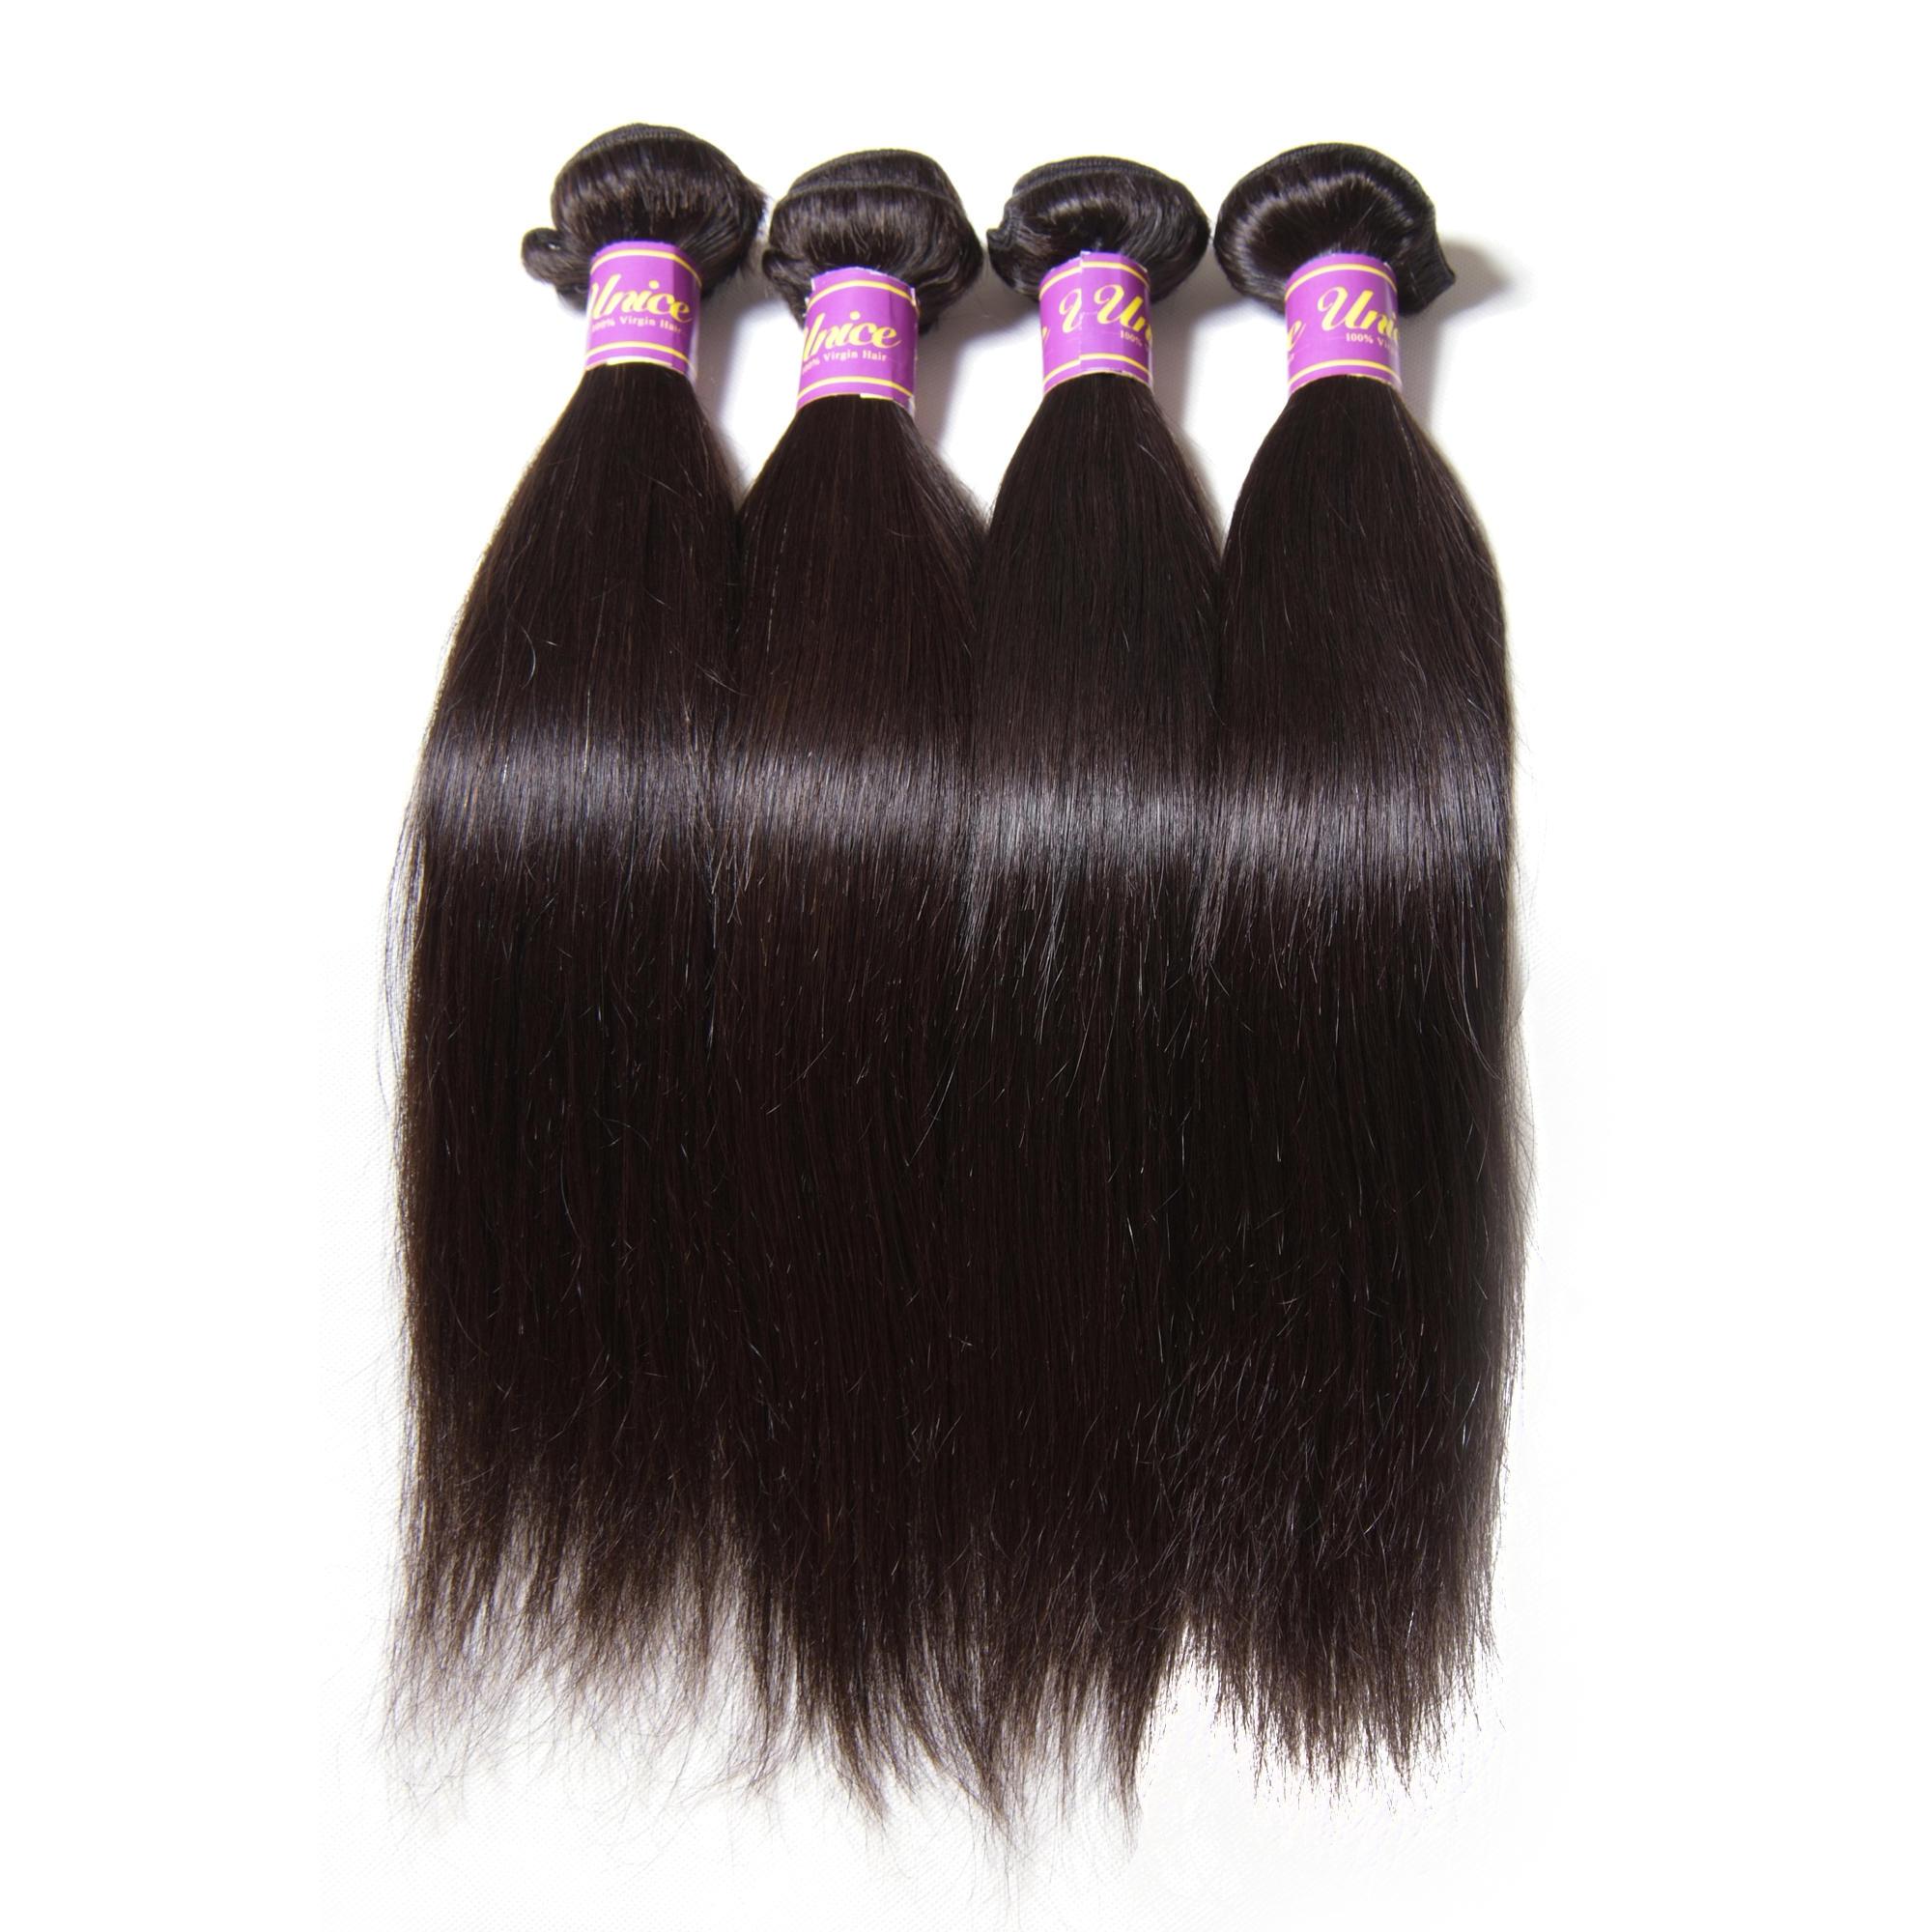 UNice Hair image 26